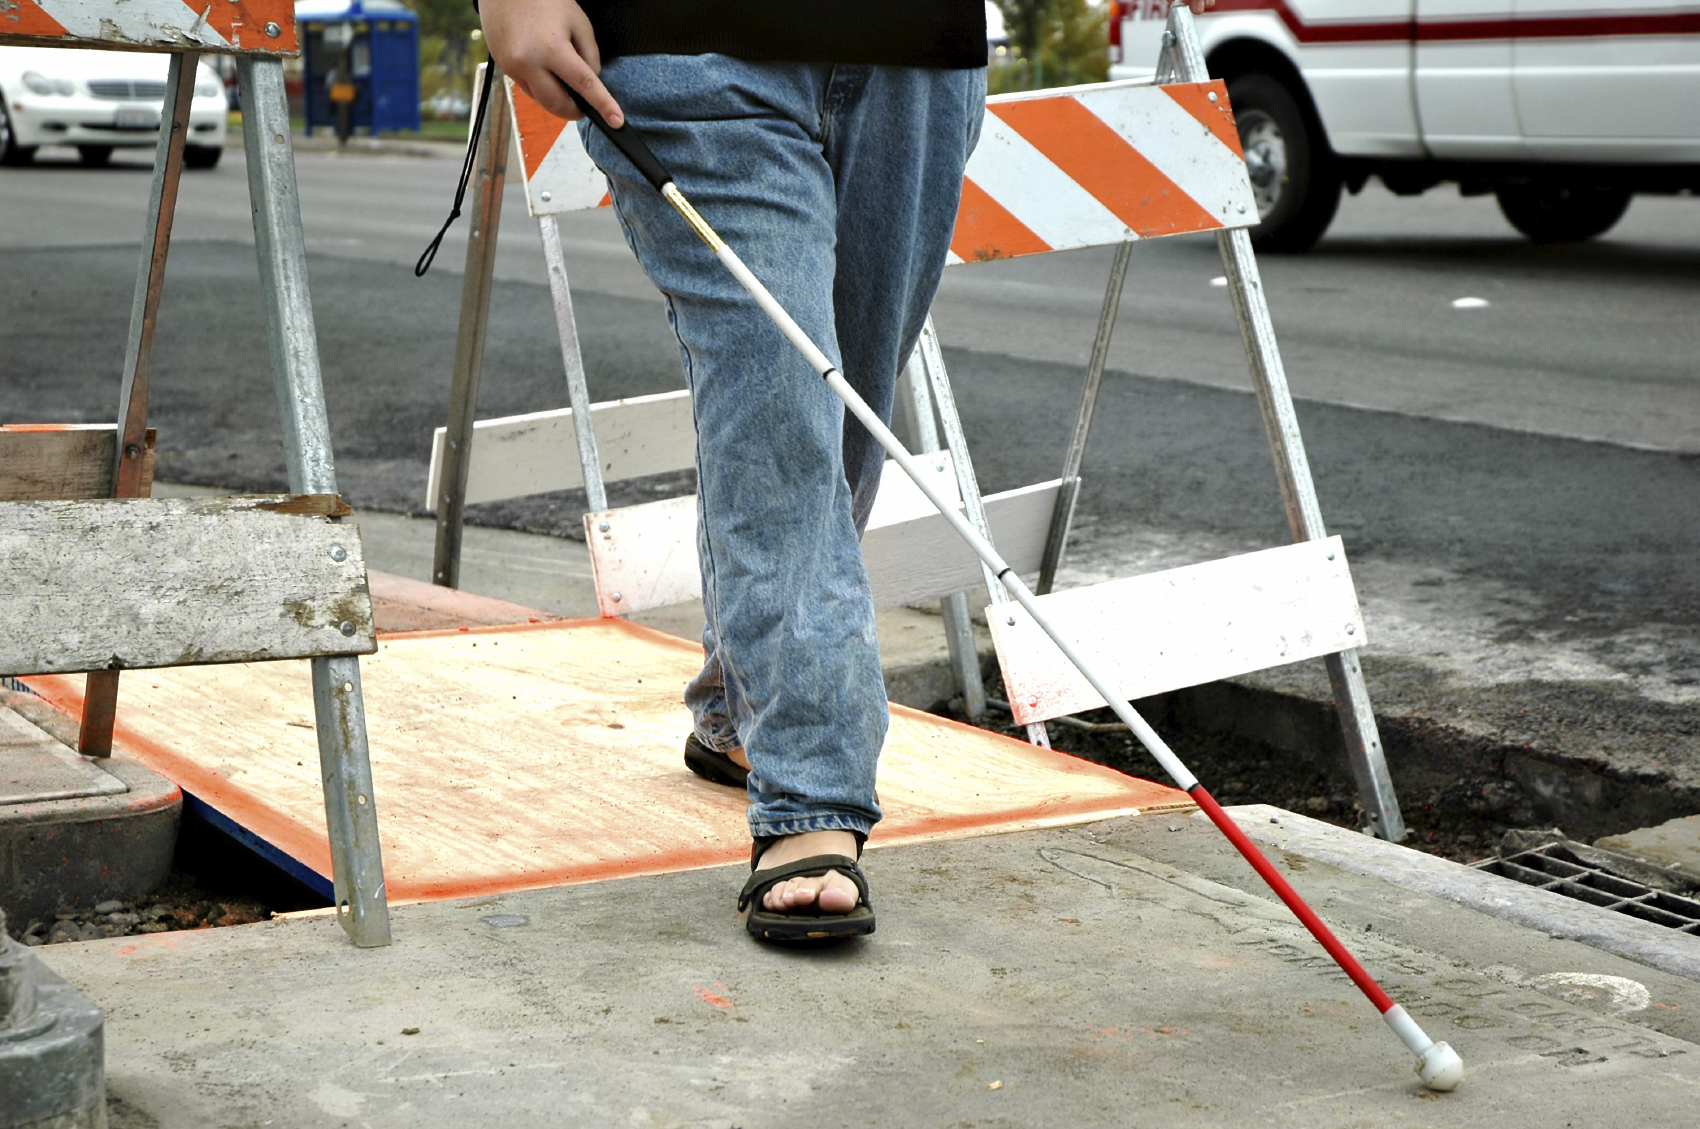 A man uses a white cane to navigates through construction on a sidewalk